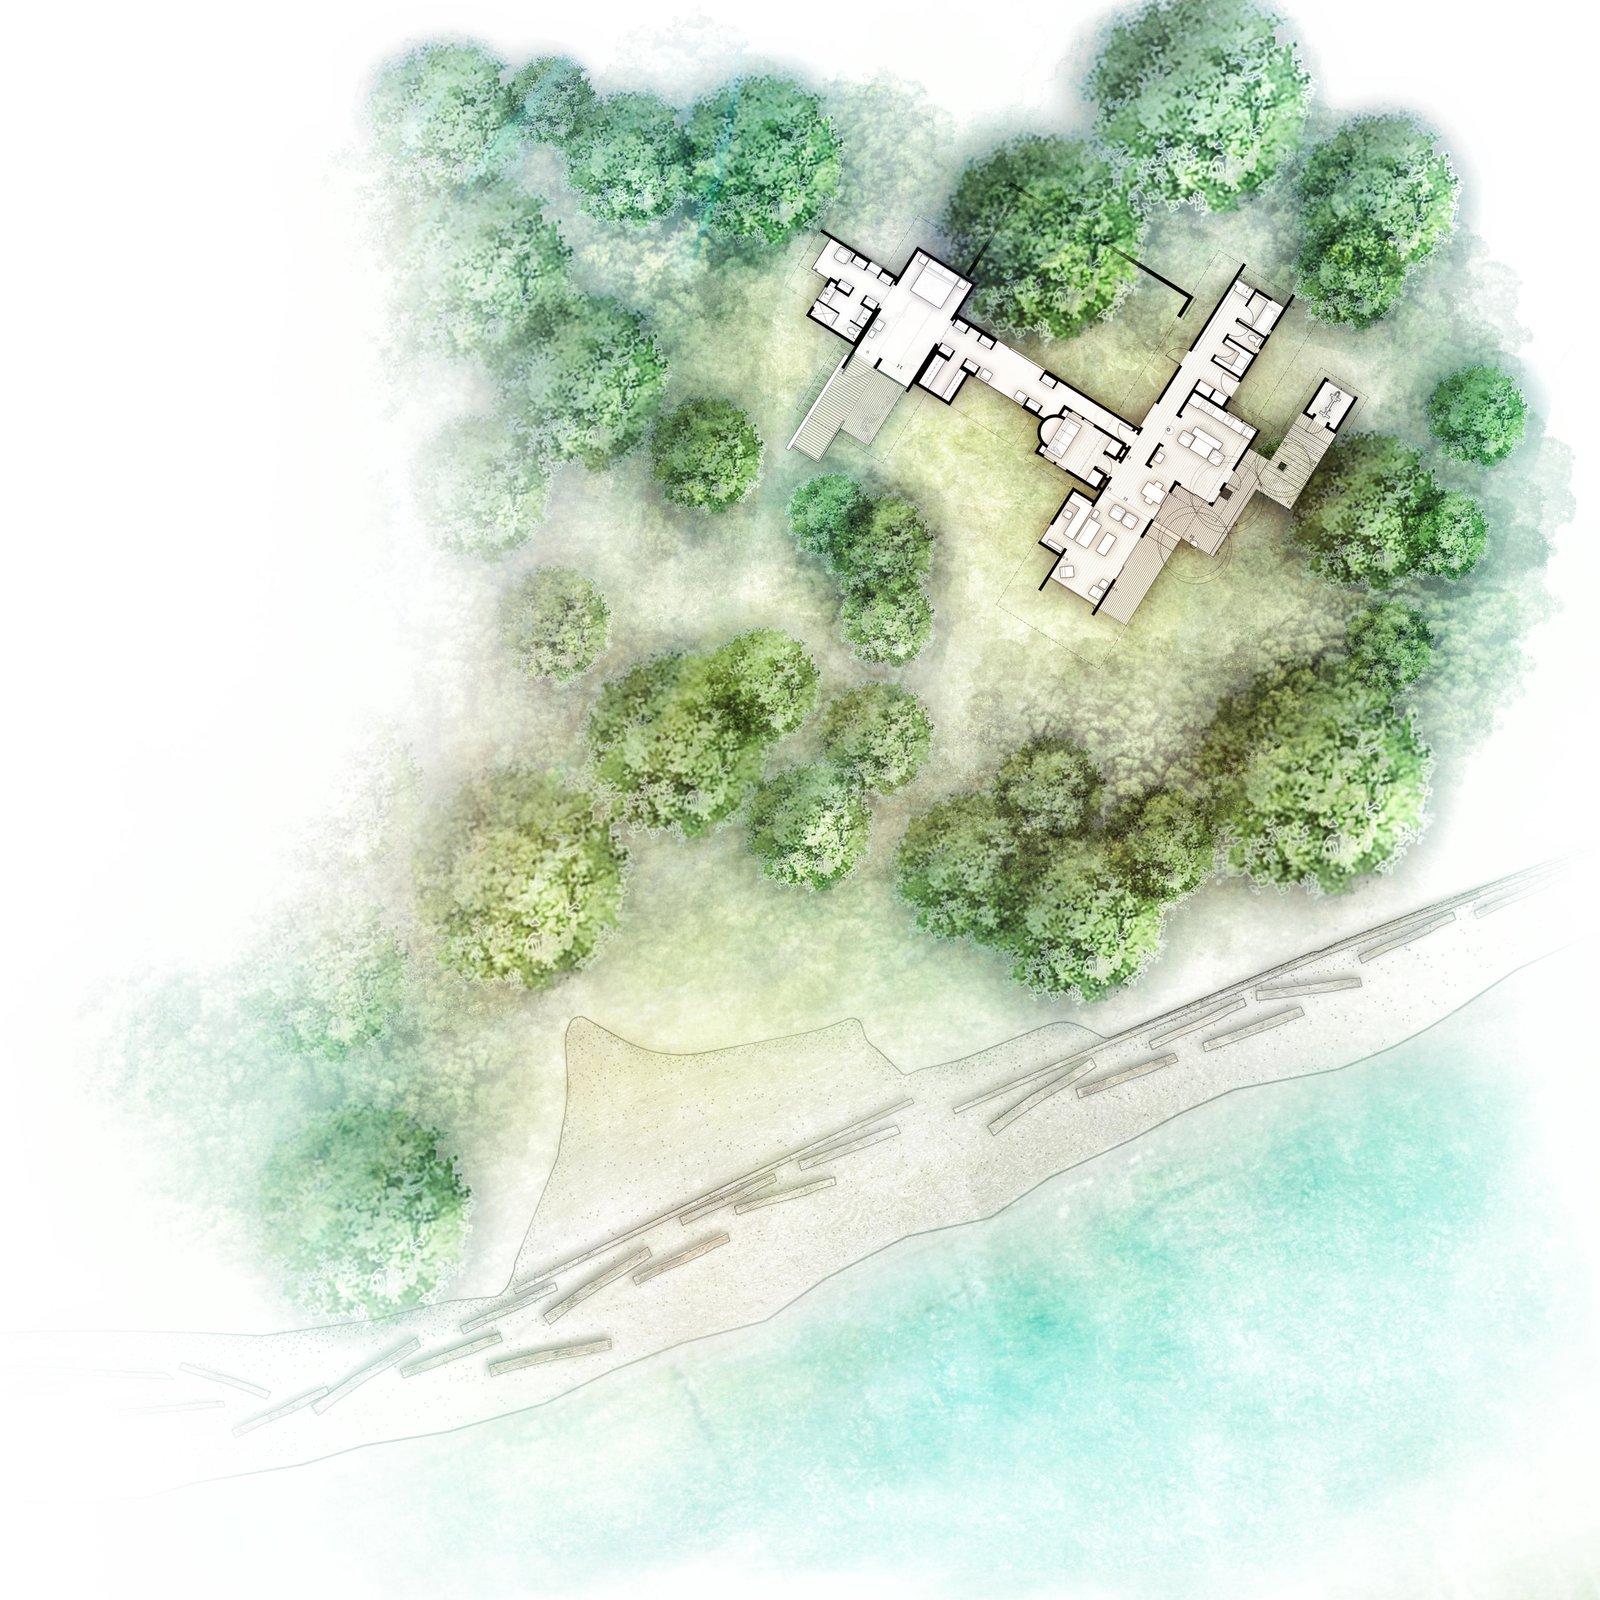 cabin-at-longbranch-site-plan.jpg